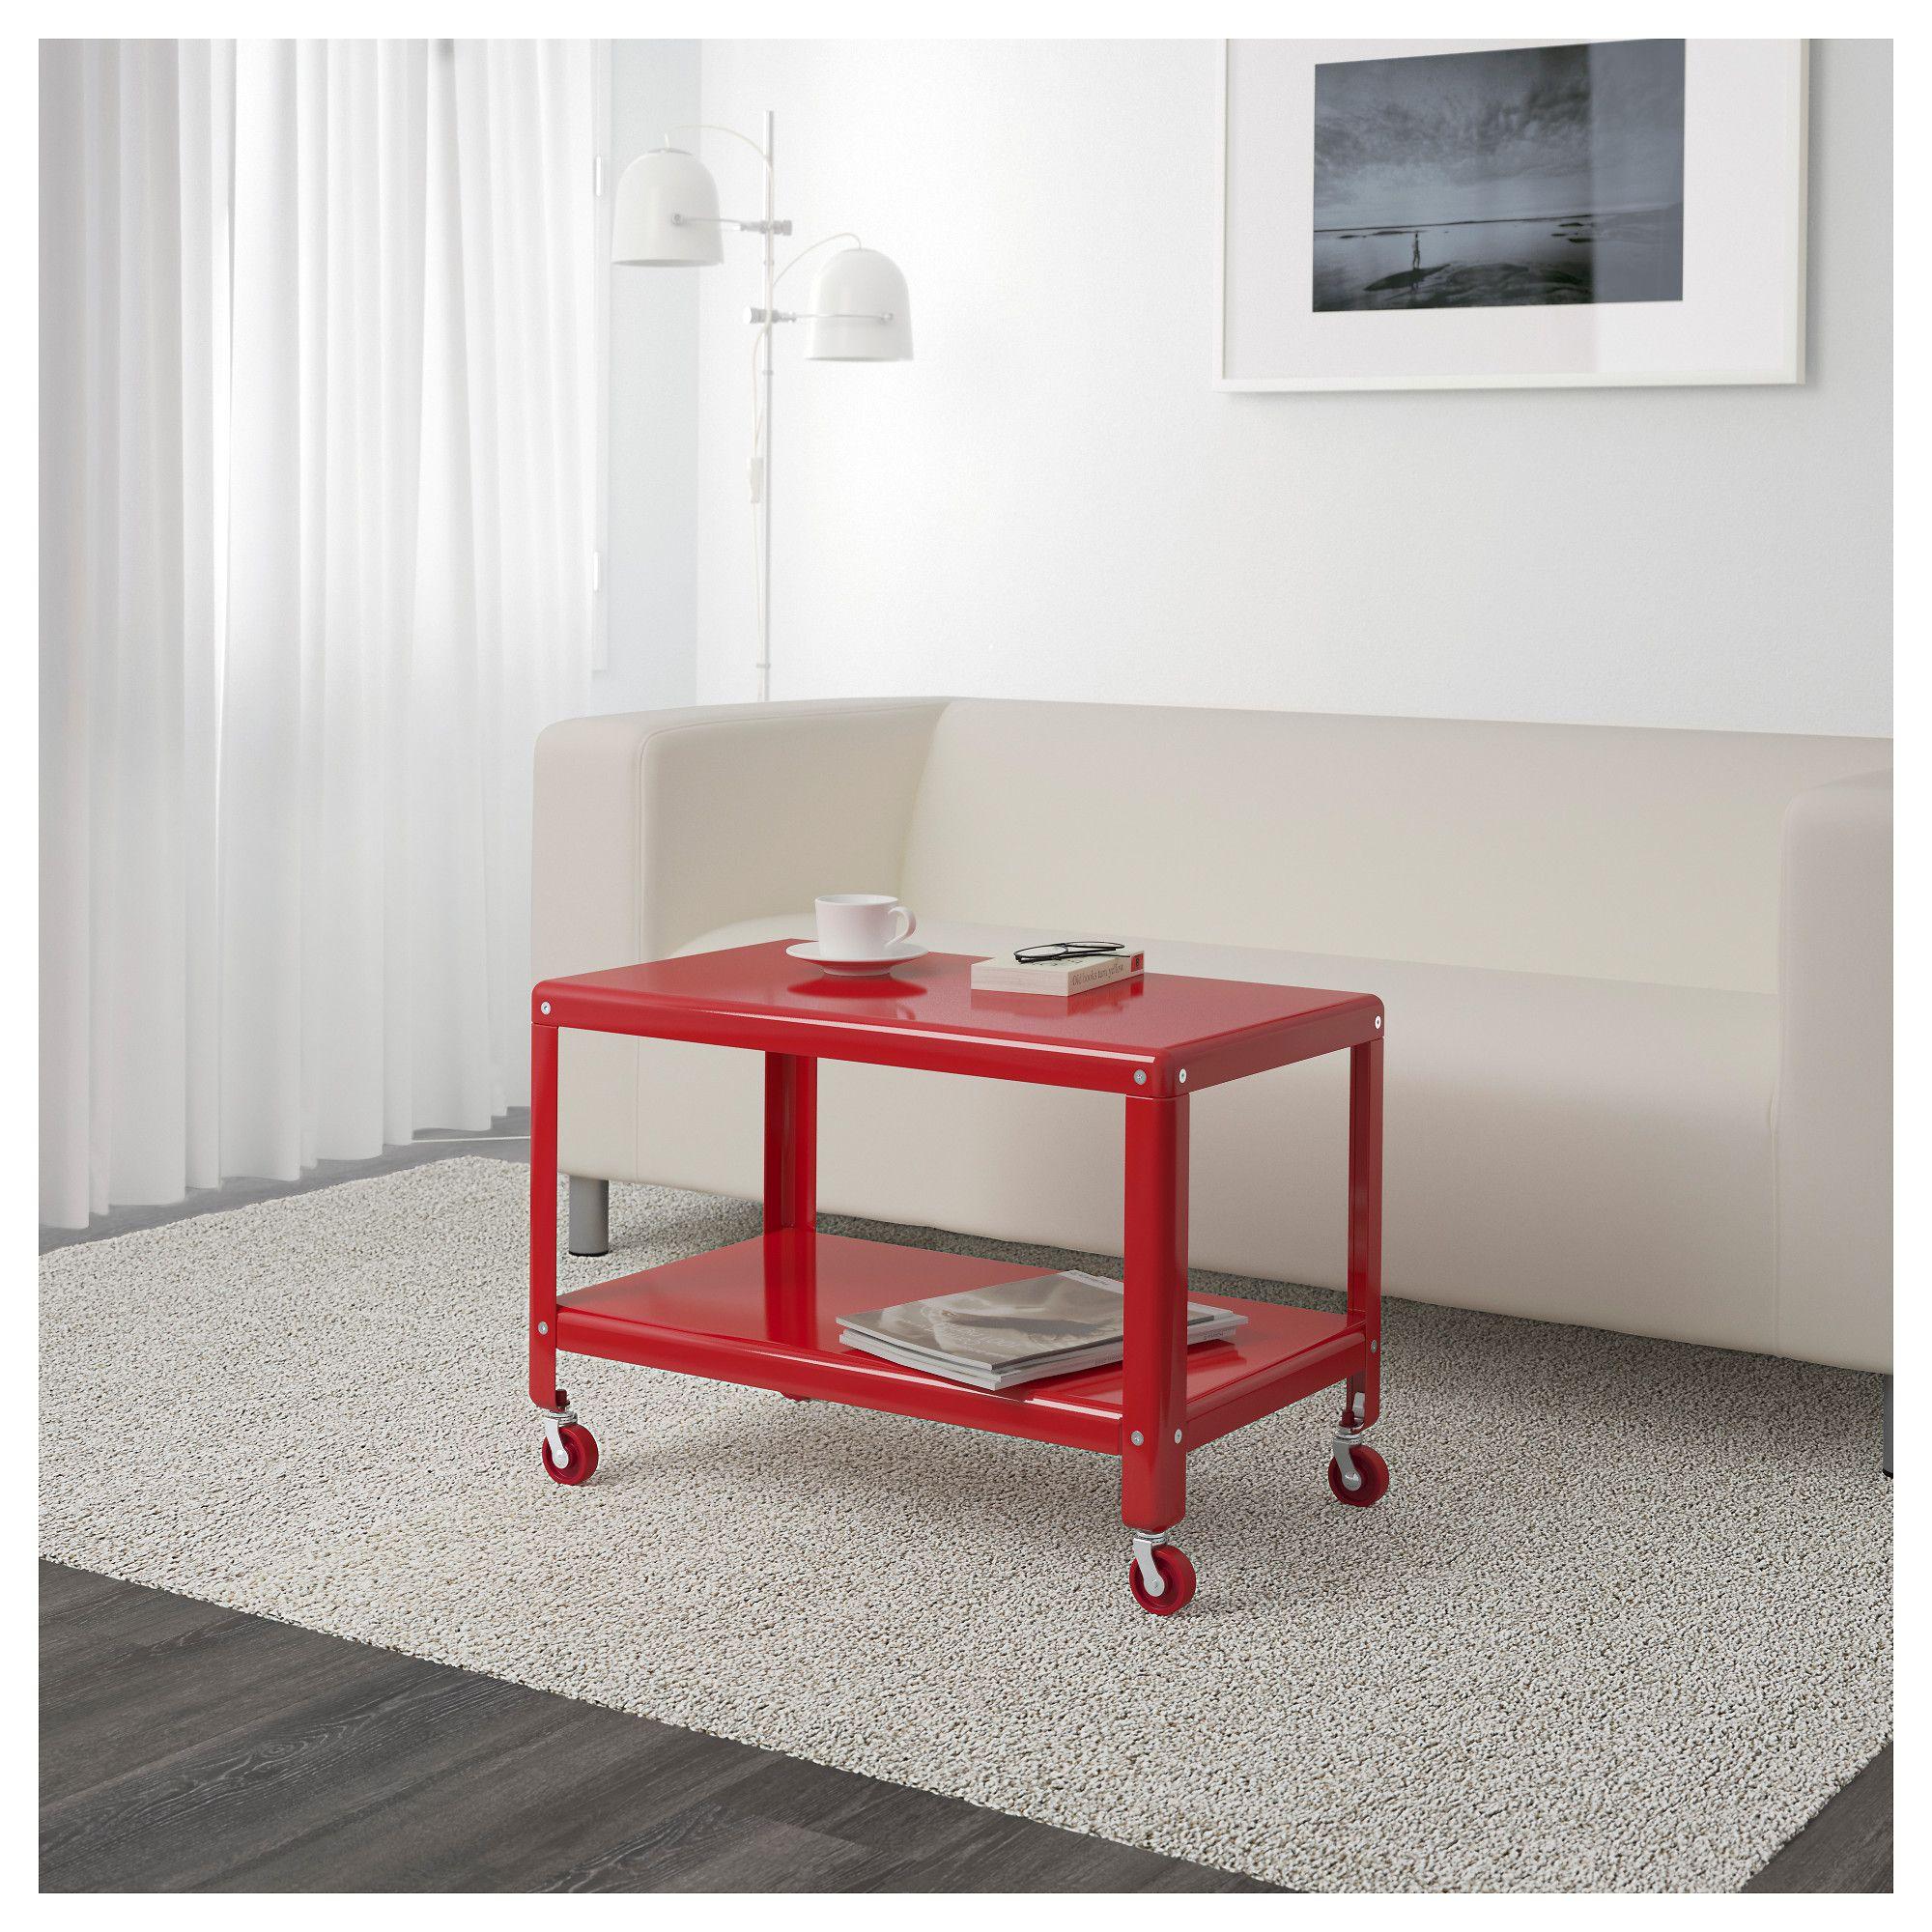 Fresh Home Furnishing Ideas And Affordable Furniture Ikea Ps 2012 Ikea Ps Ikea Coffee Table